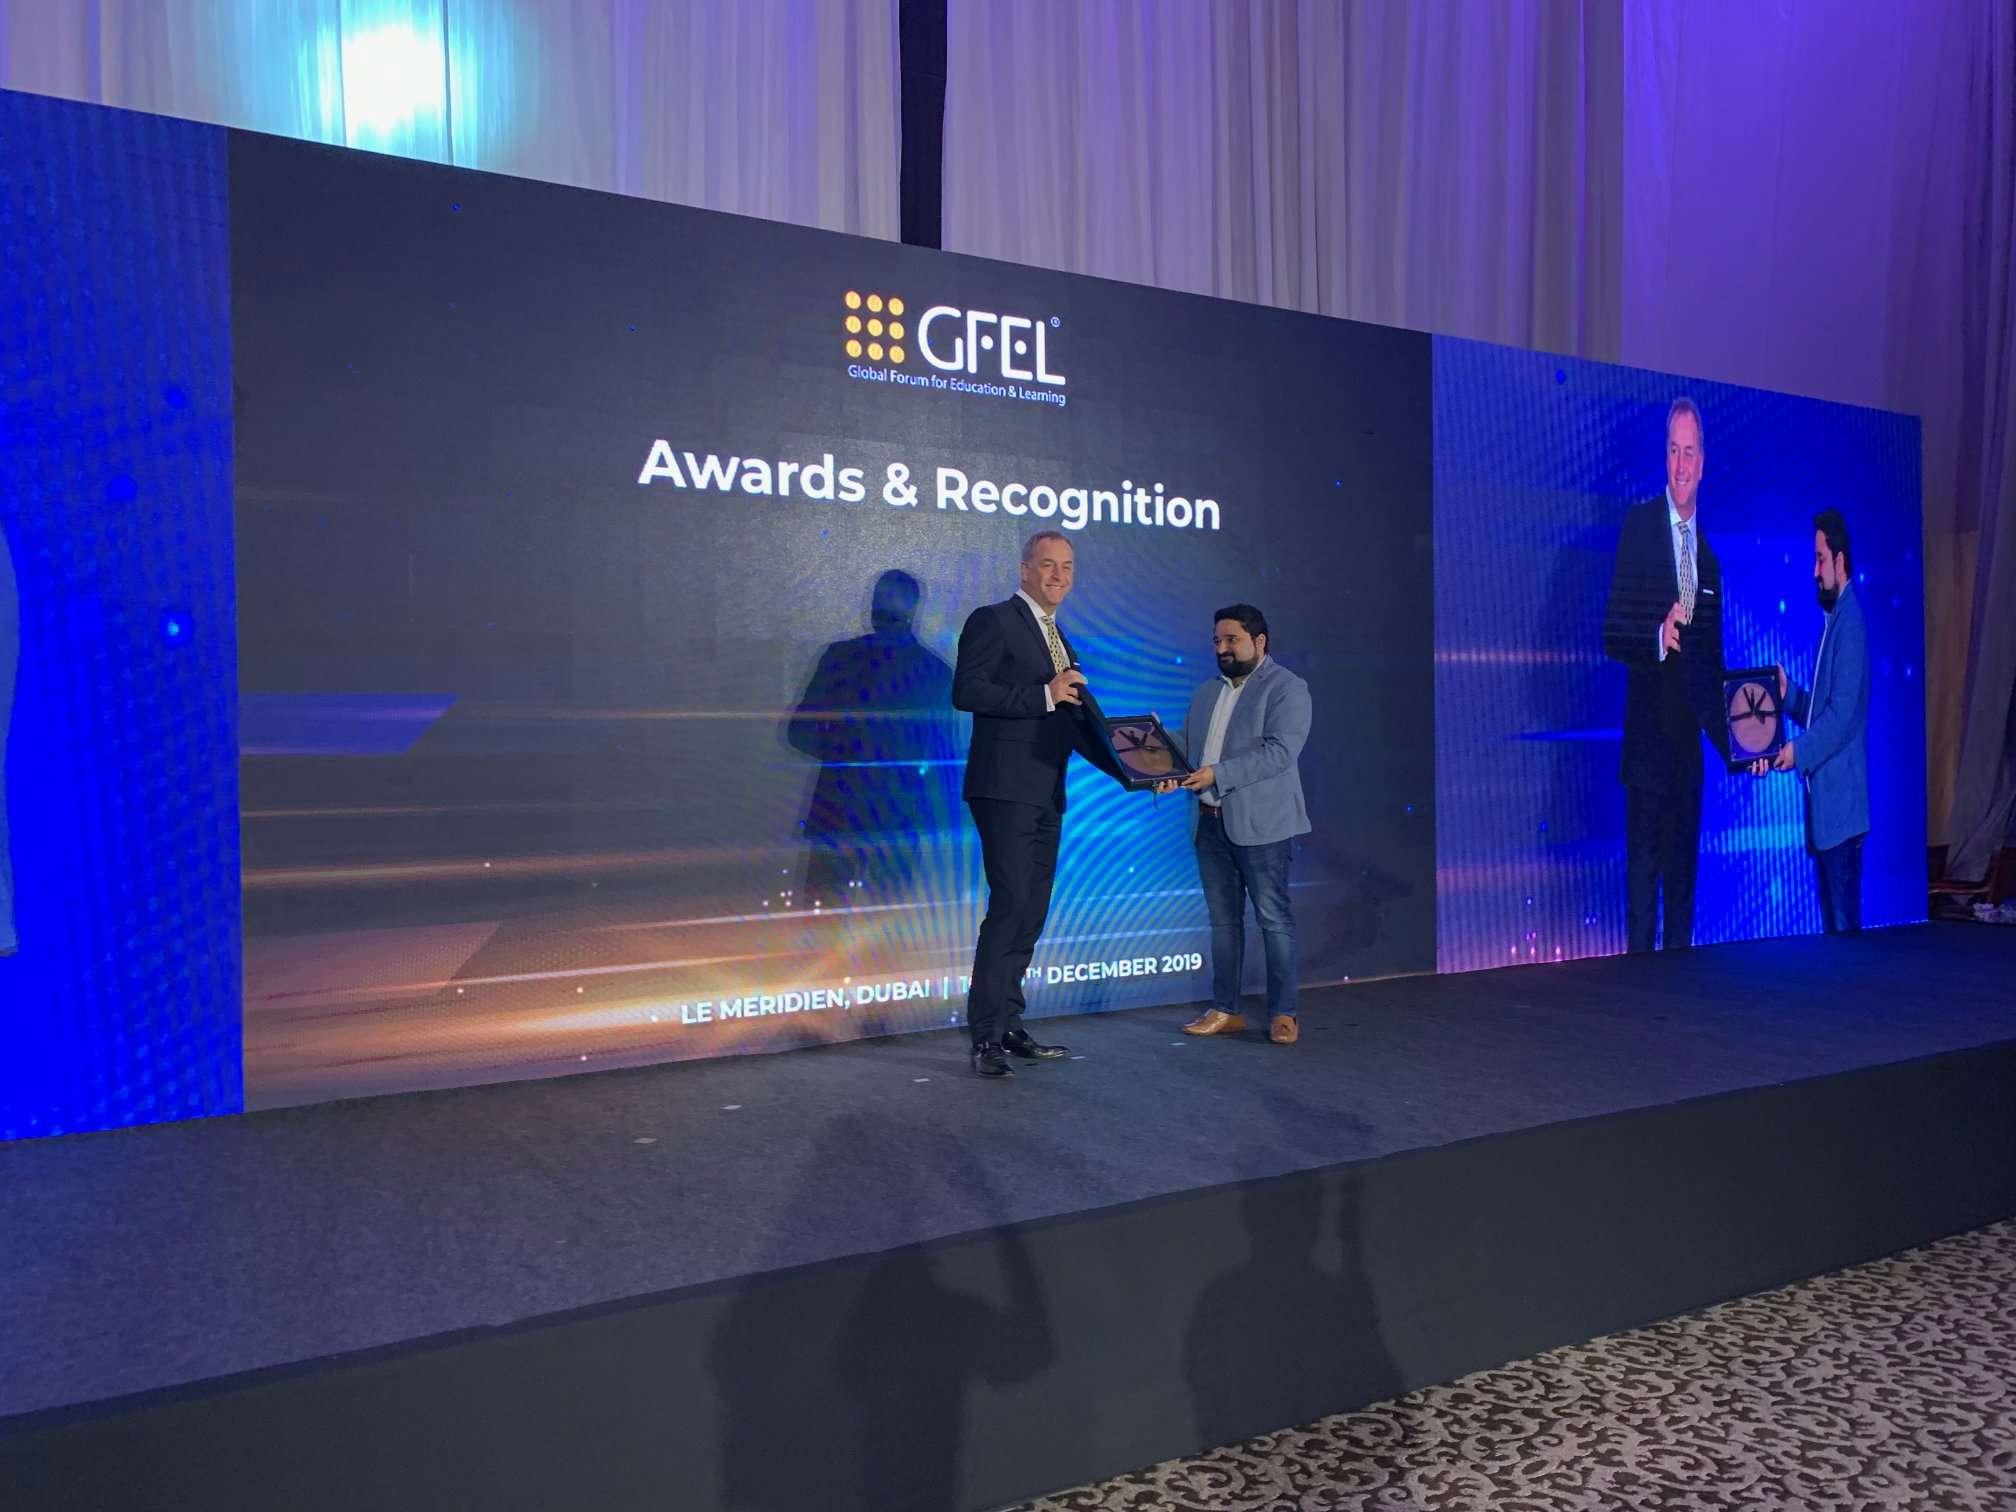 Klick Data awarded GFEL Top 50 Organizations in Education Award